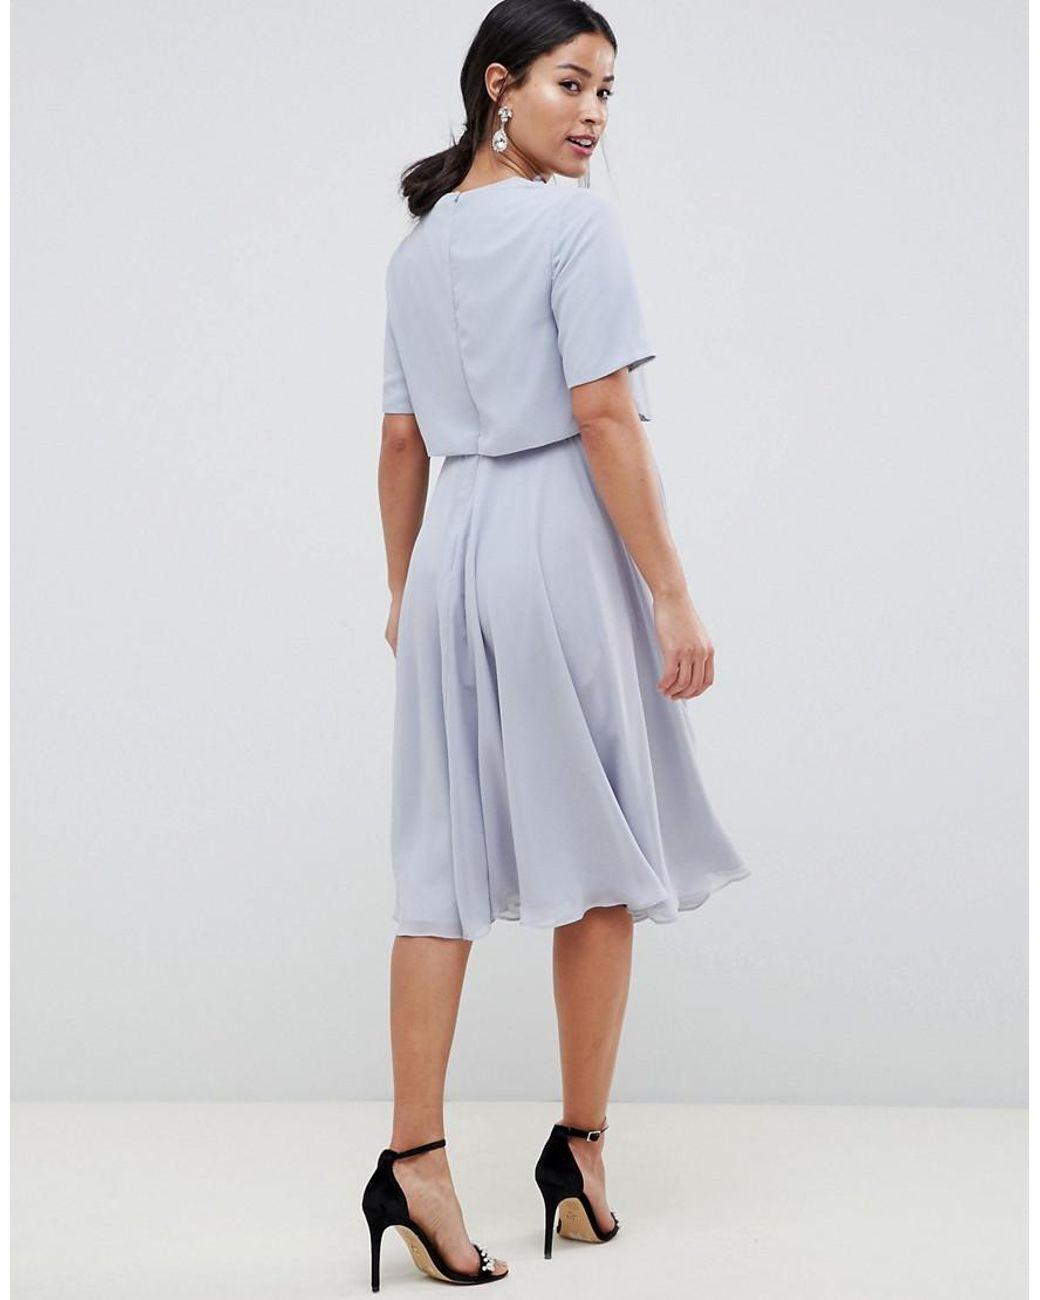 f3b21cb75338 ASOS Asos Design Maternity Nursing 3d Embellished Crop Top Midi Skater Dress  in Blue - Lyst